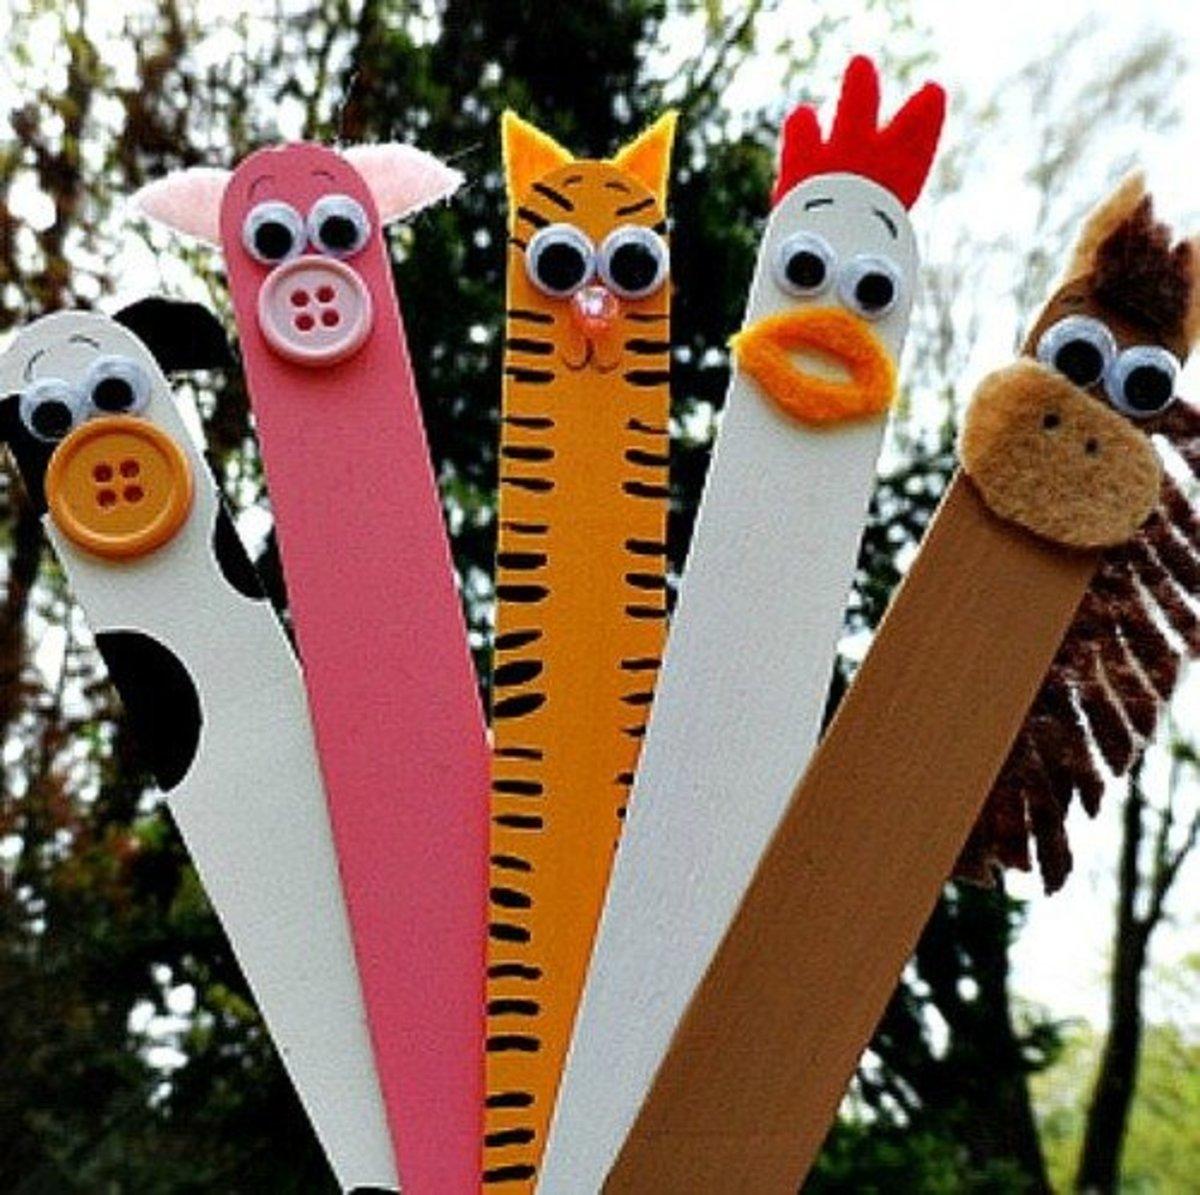 45 Outstanding Popsicle Craft Stick DIY Ideas | FeltMagnet